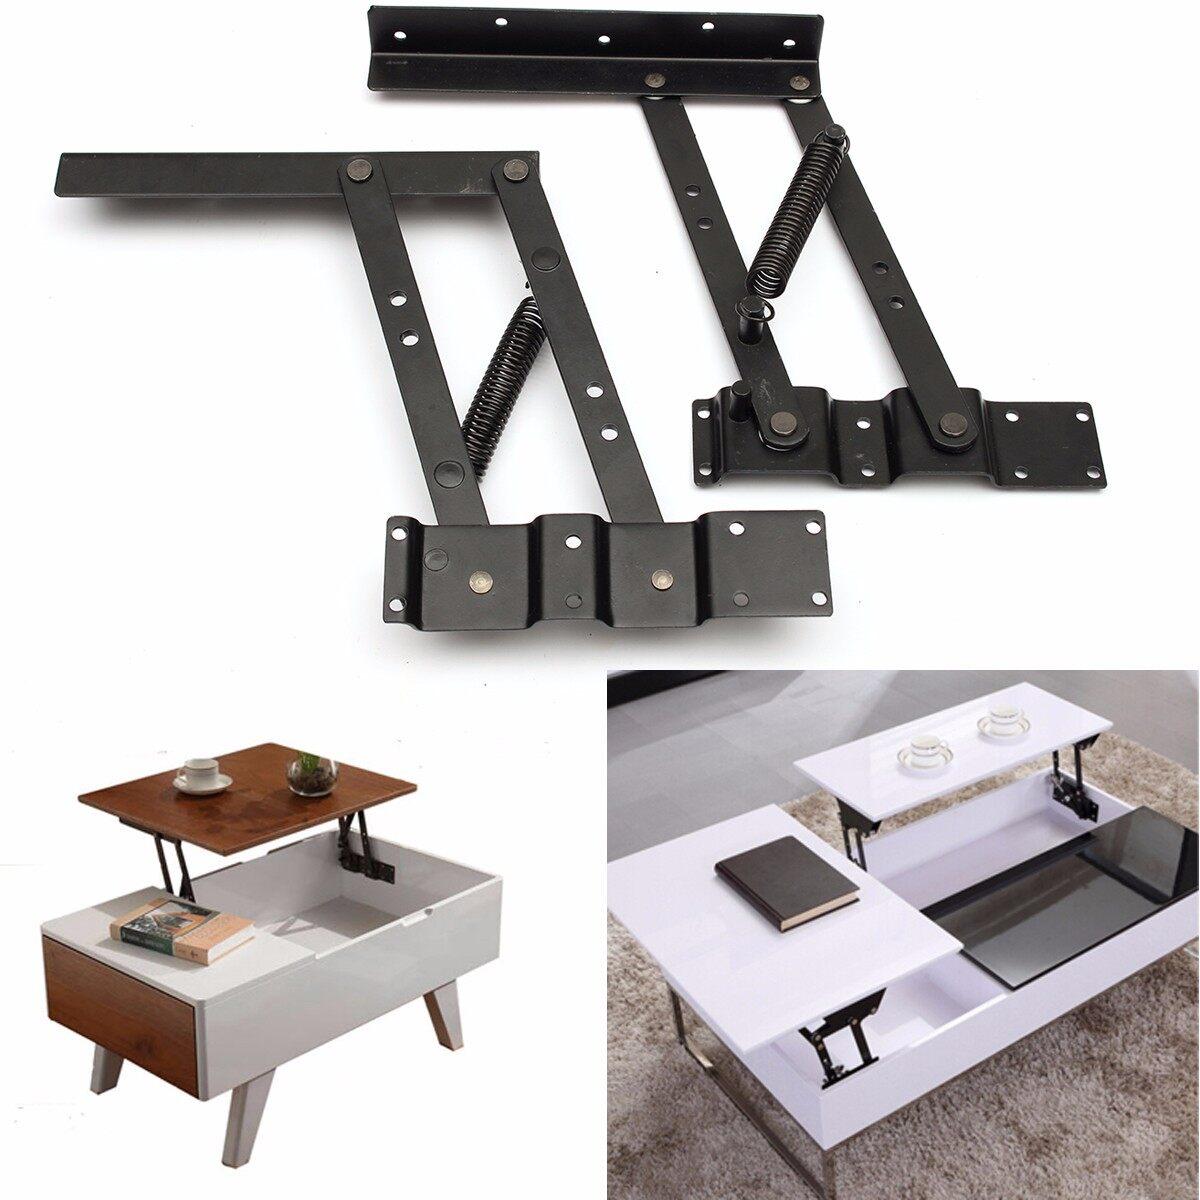 Lift Top Coffee Table Mechanism.2pcs Lift Up Top Coffee Table Lifting Frame Mechanism Spring Hinge Har